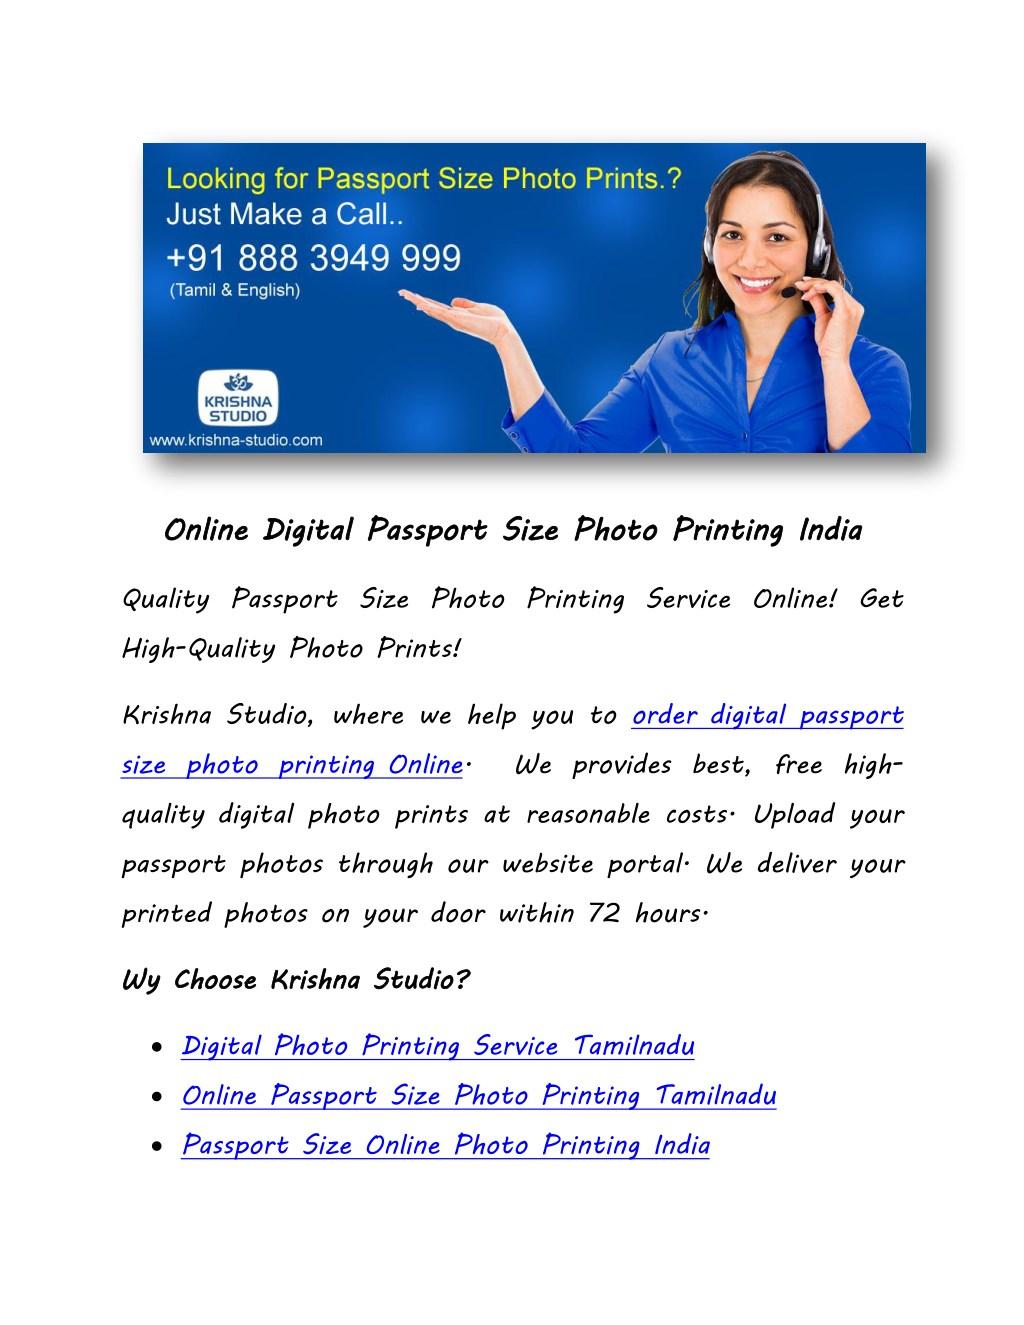 Ppt Online Digital Passport Size Photo Printing India Powerpoint Presentation Id 8005564